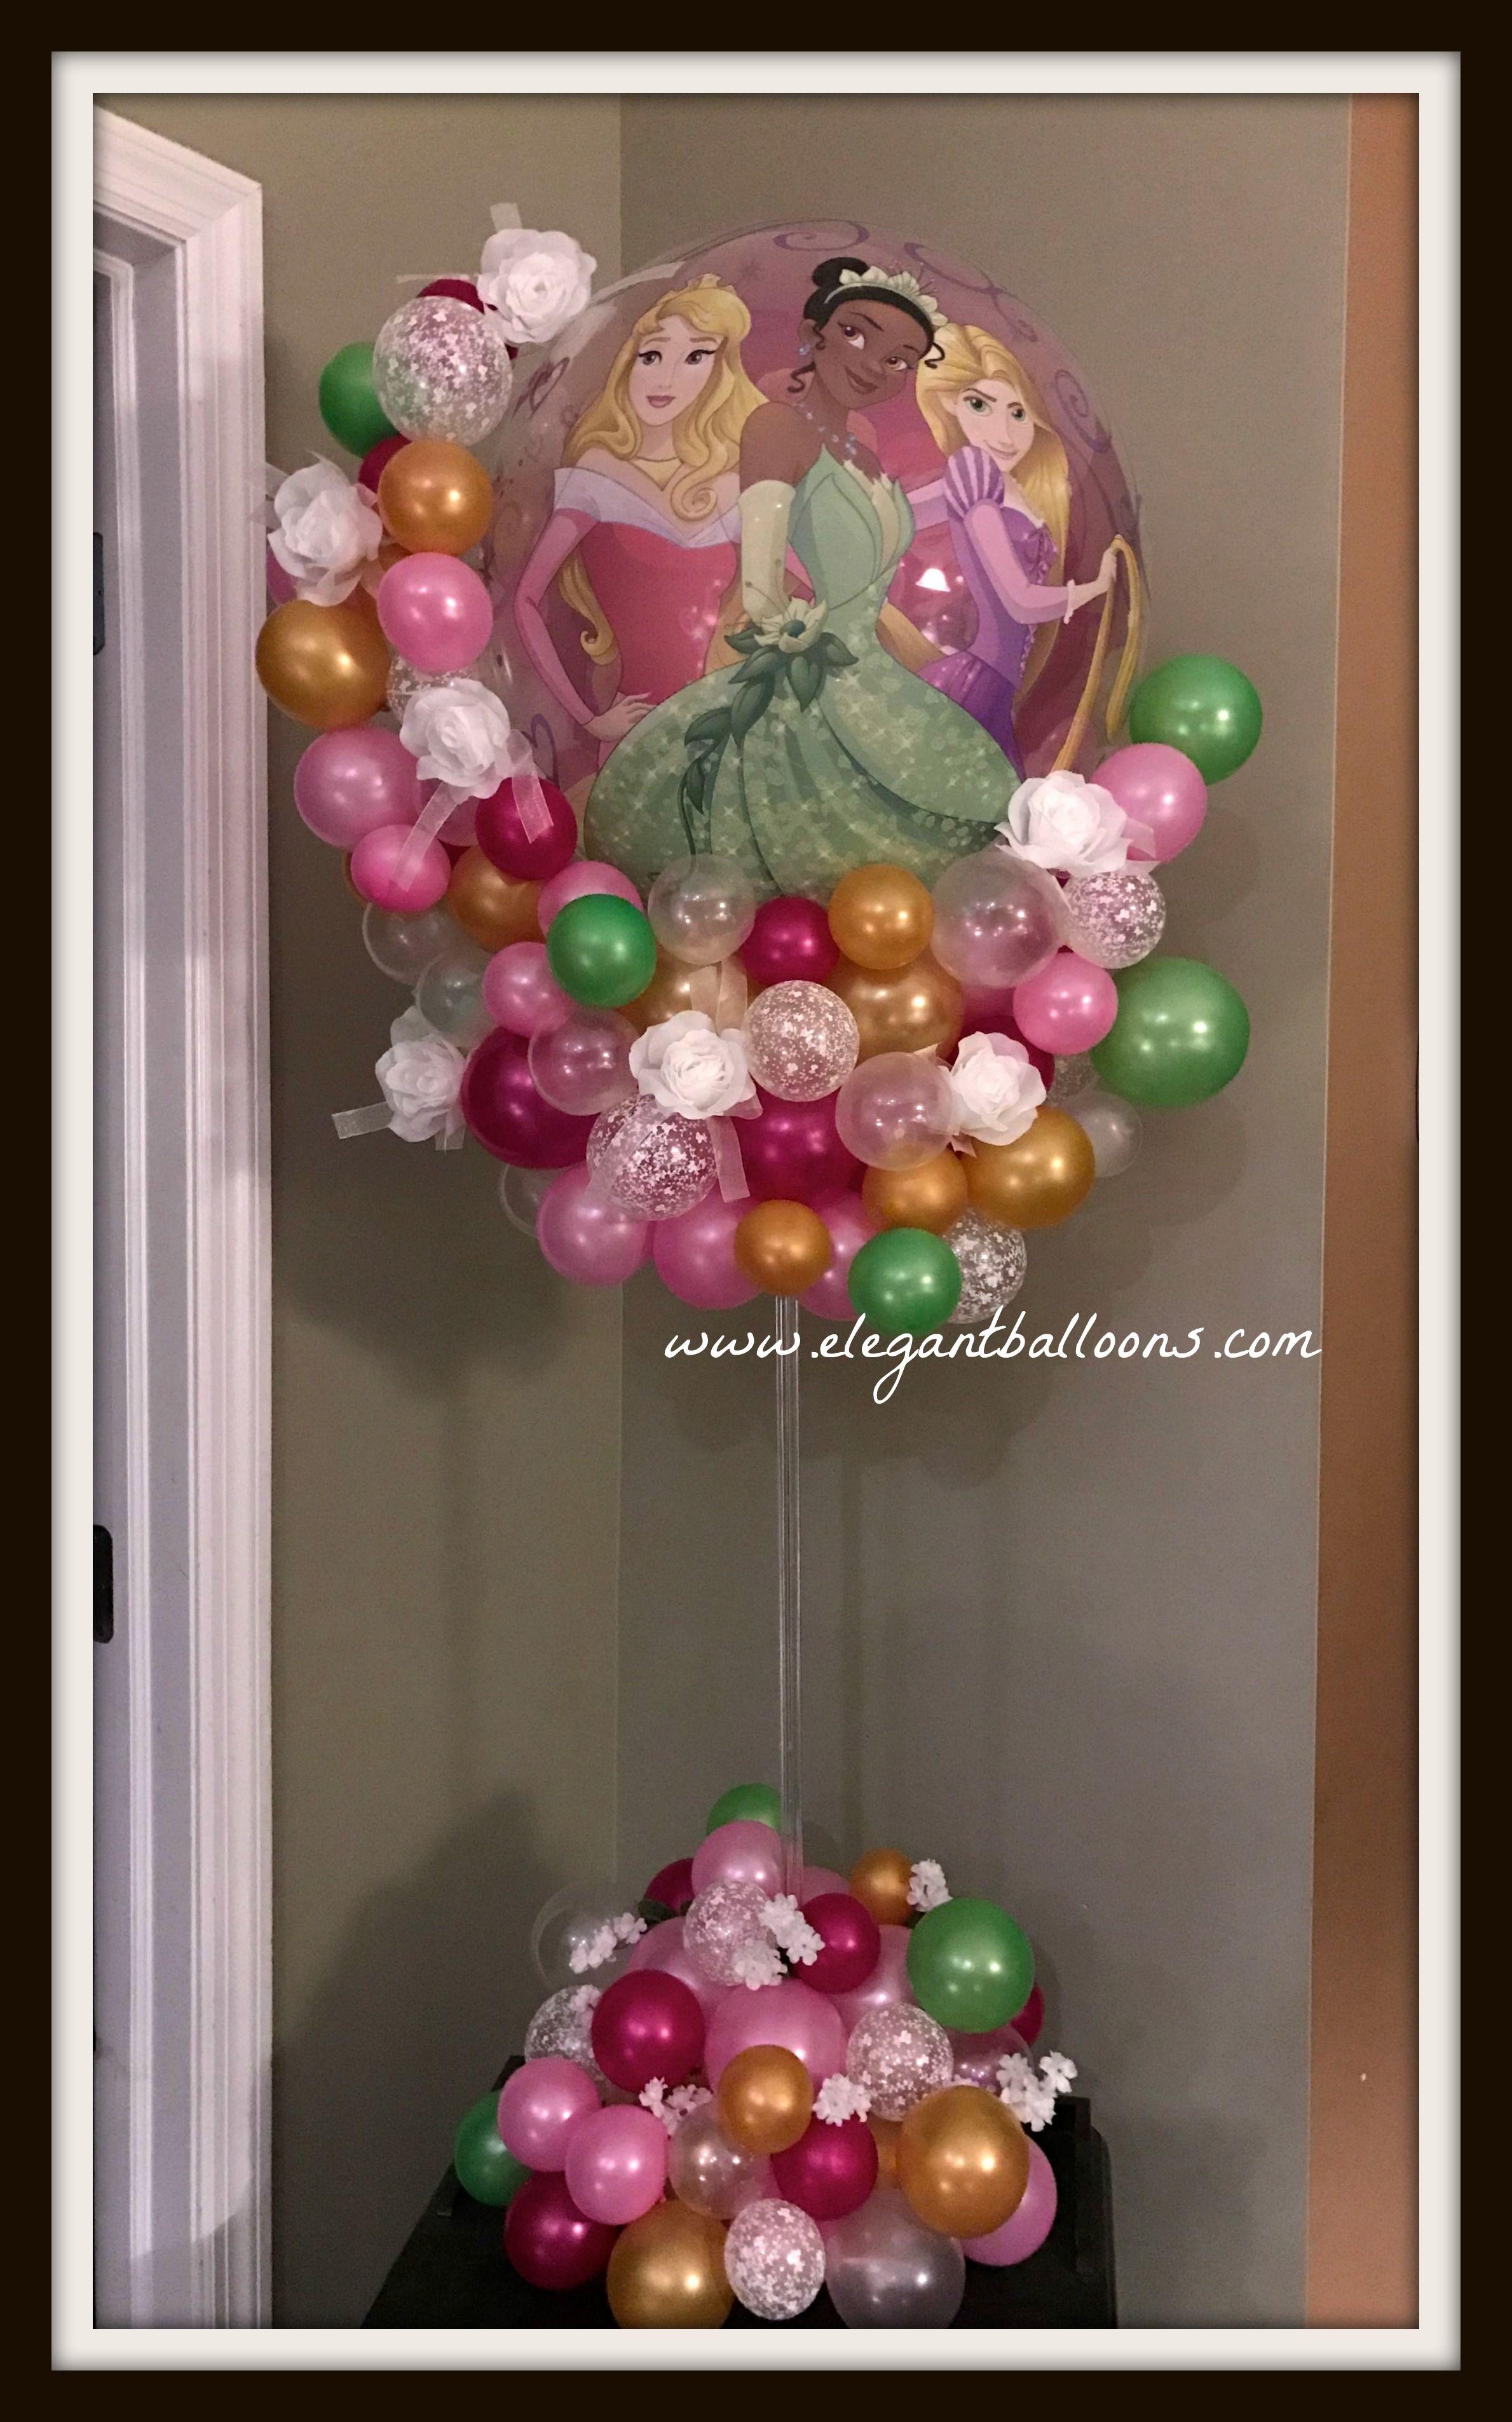 Princess Balloon Decoration Princess Balloon Centerpiece Wwwelegantballoonscom Elegant